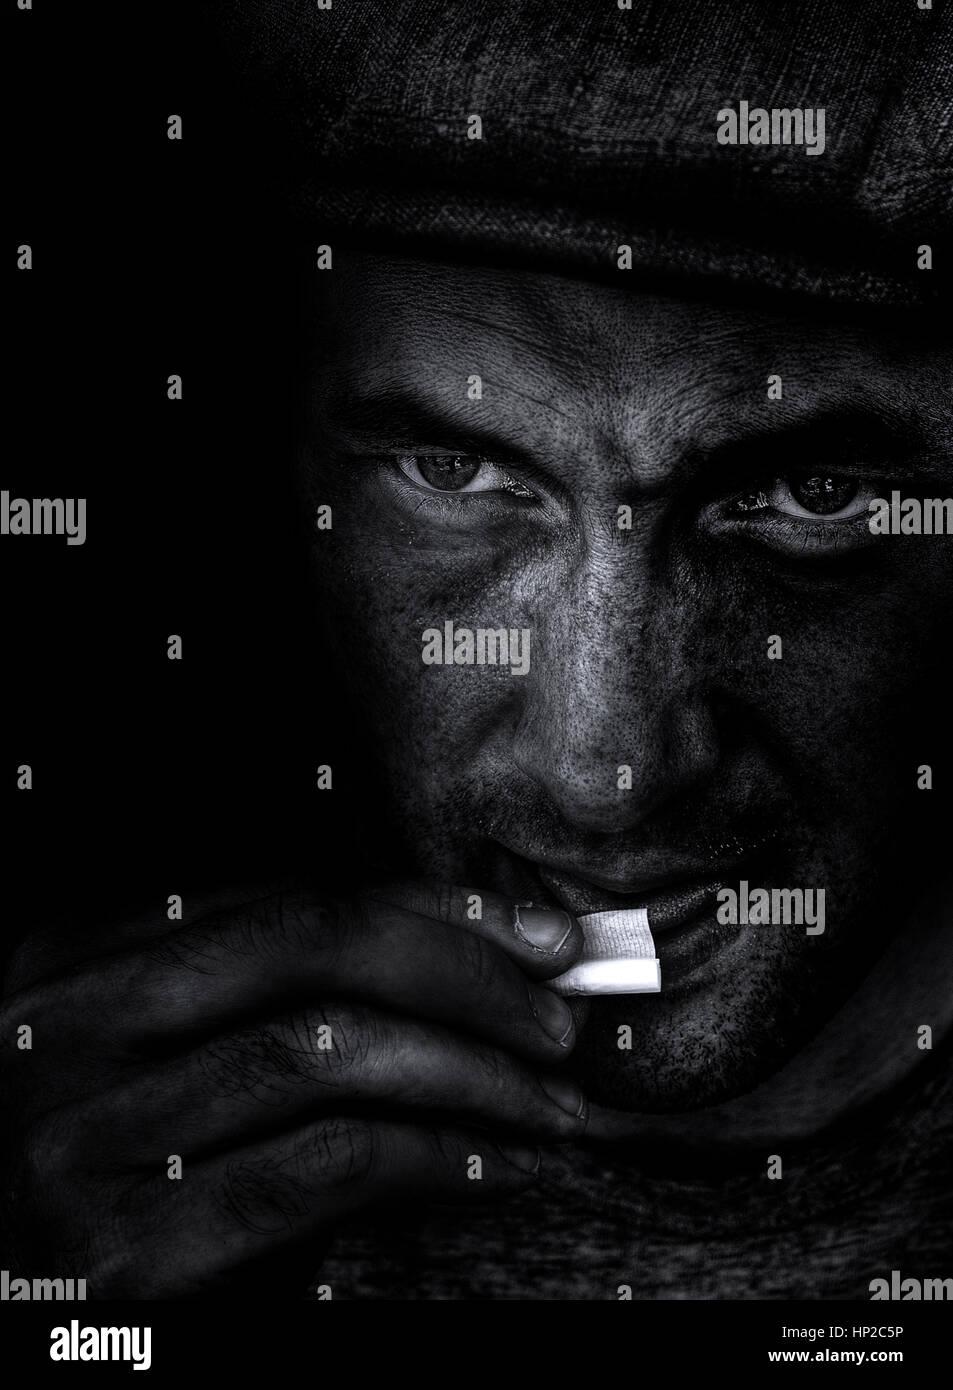 Dirty man portrait - Stock Image